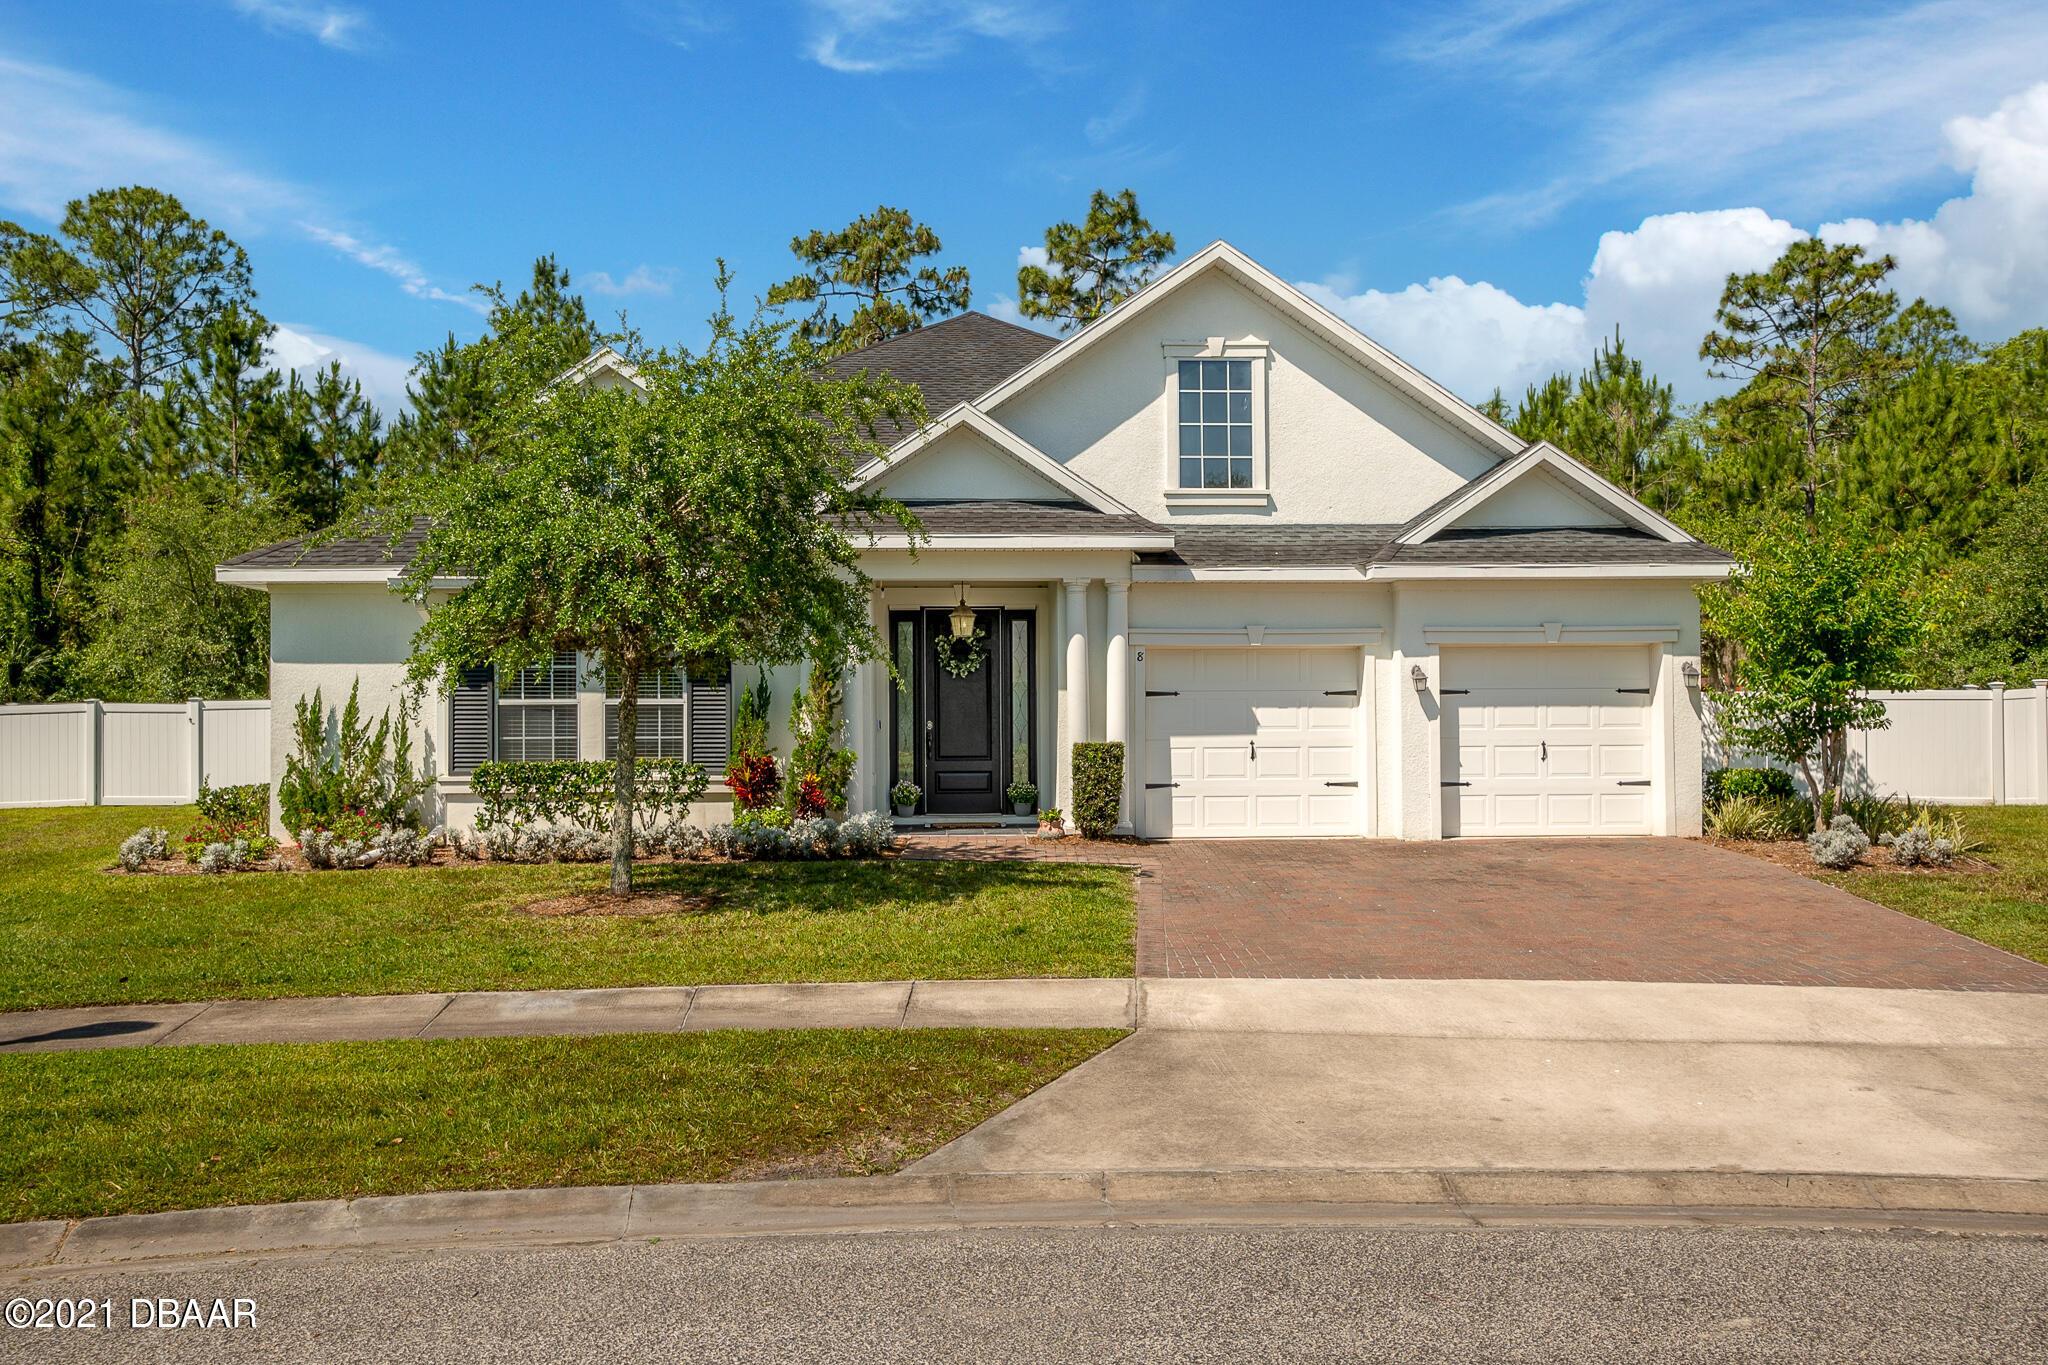 Photo of 8 Dormer Drive, Ormond Beach, FL 32174